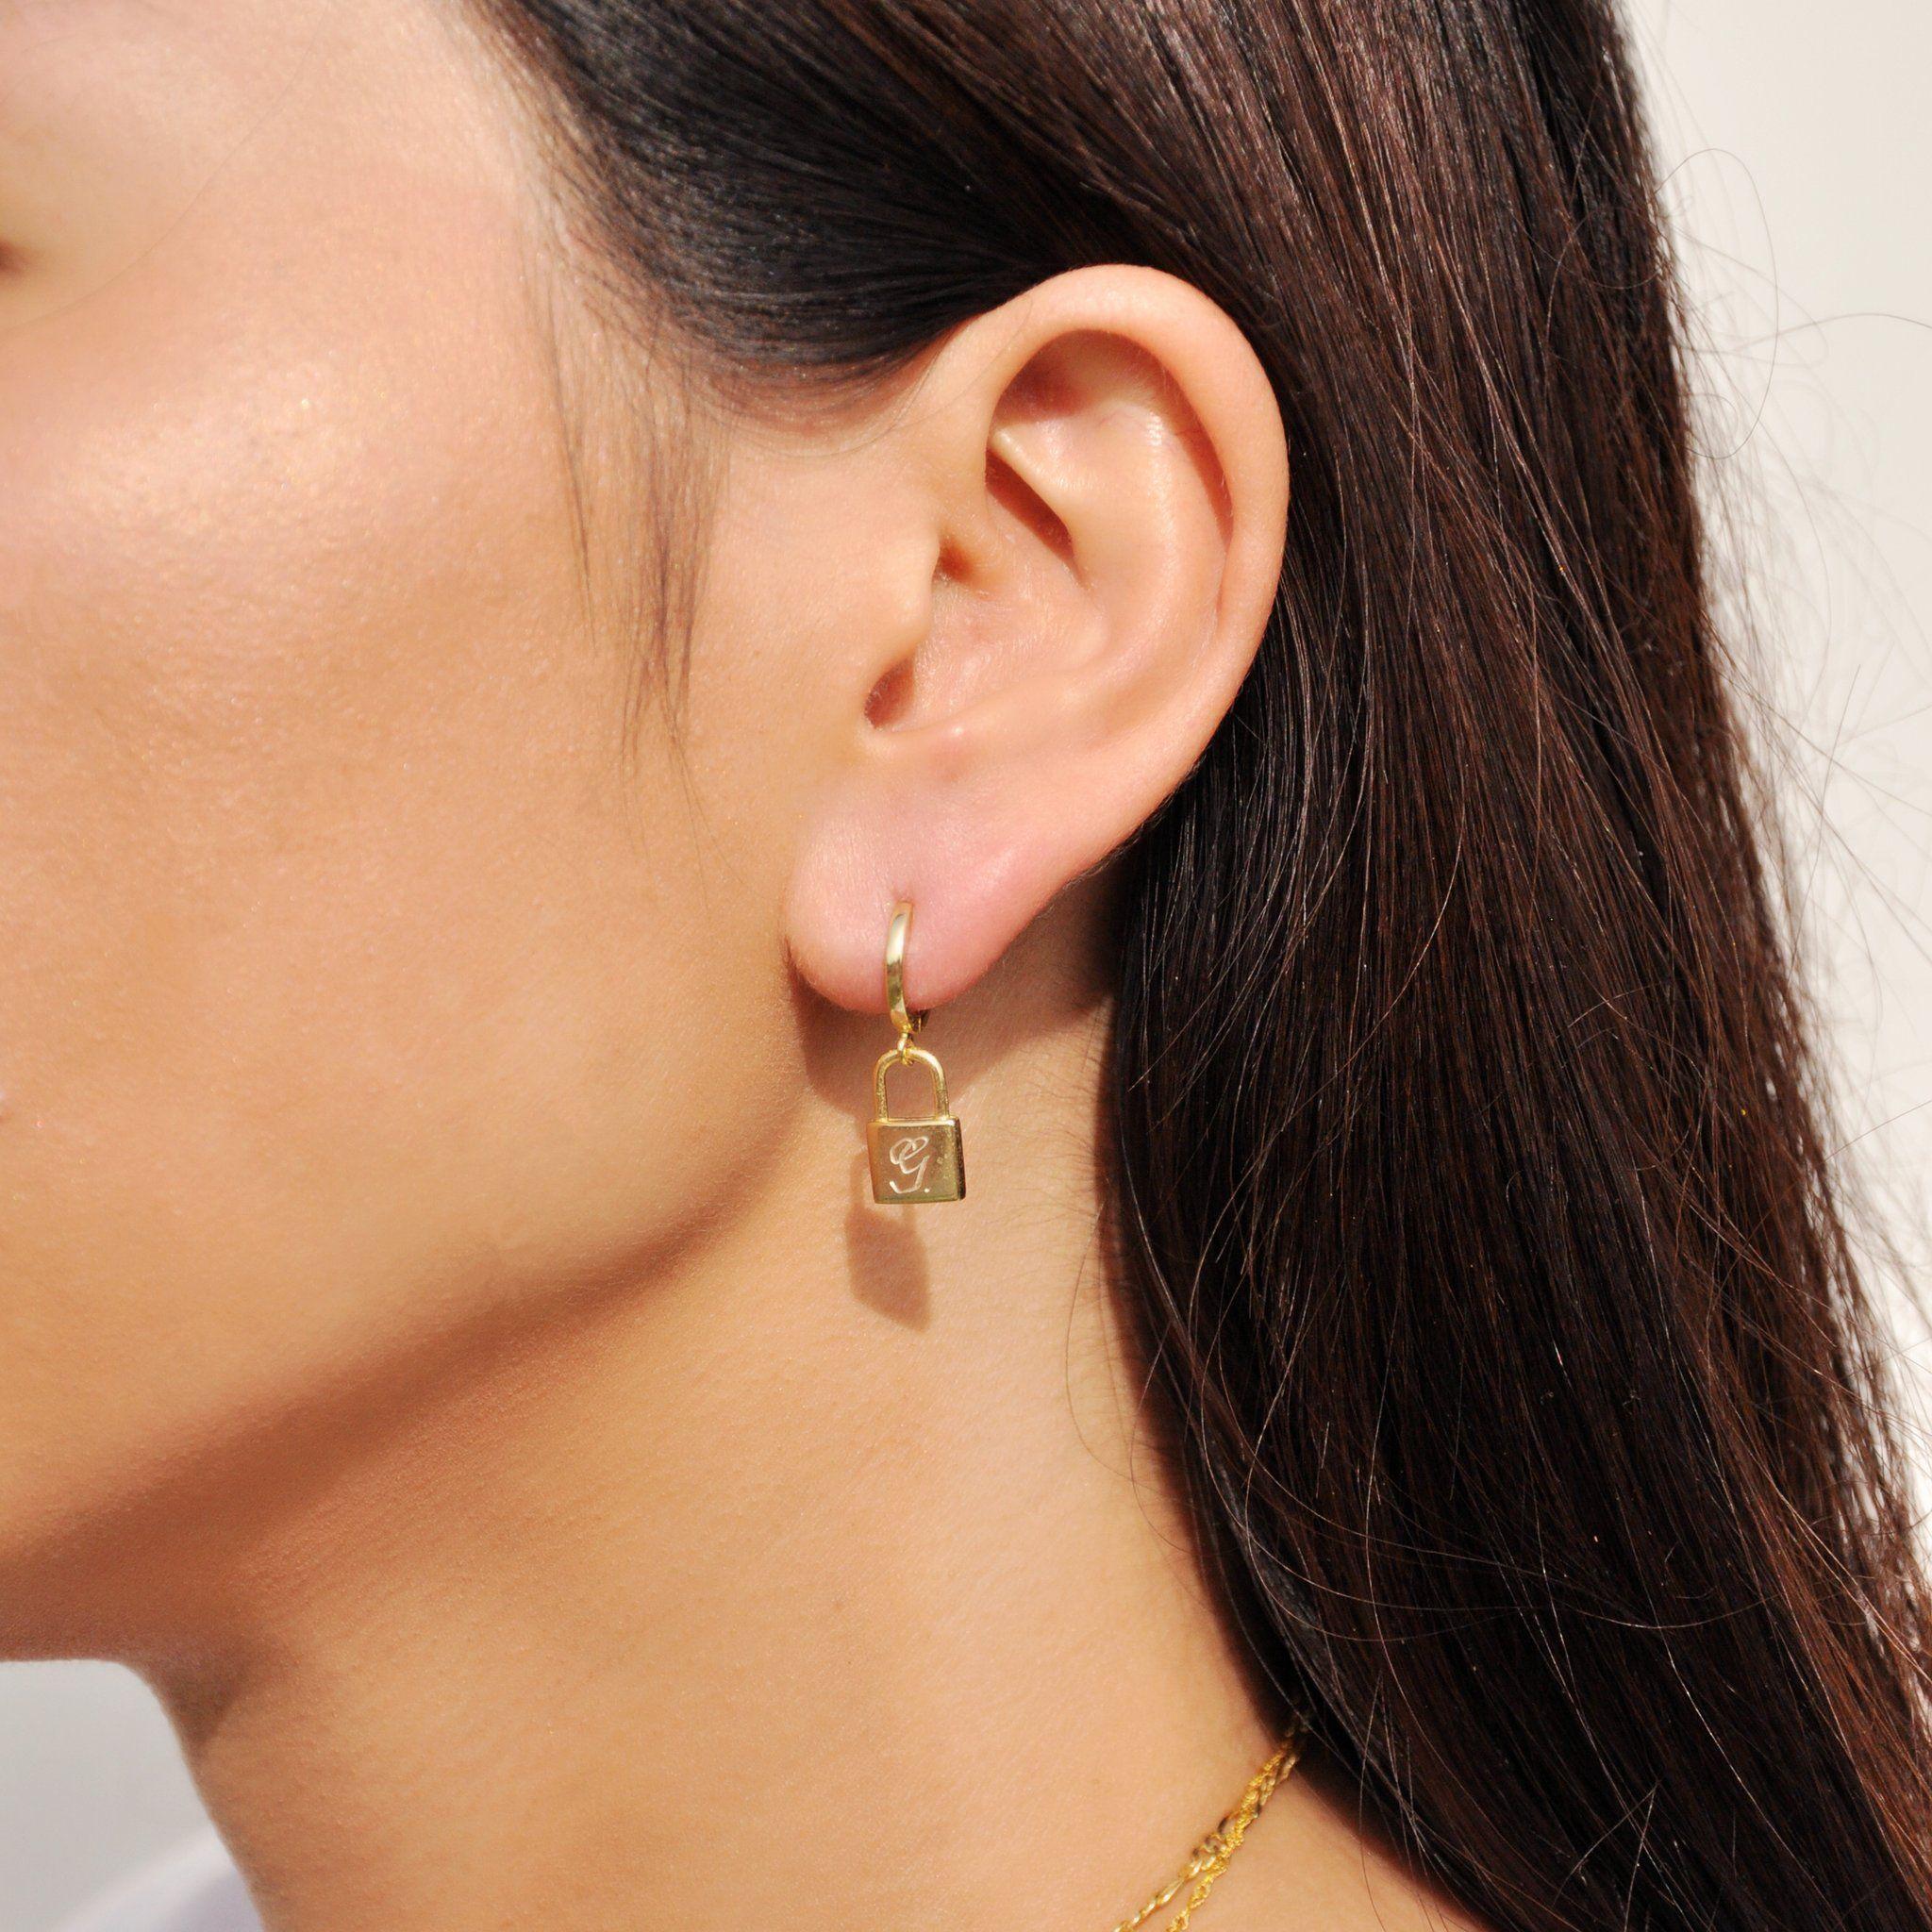 d88df573d PadLock Earrings. Engravable lock Huggies in Script Letter. #vthelabel  #sterlingsilver